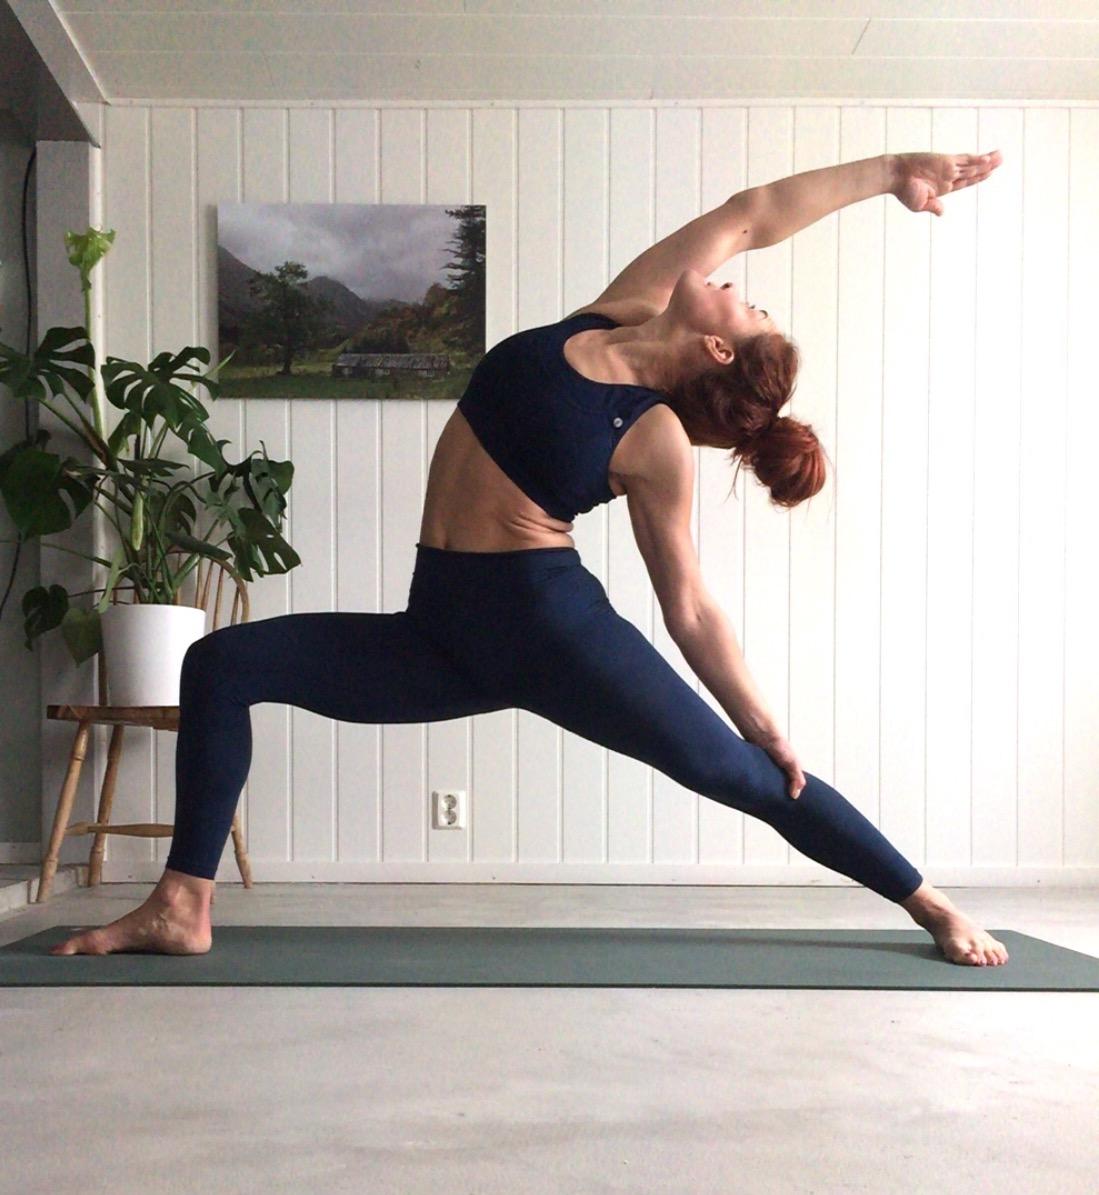 Vipararita virabhadrasana- Reverse Warrior, yoga, prayer pose, yoga i rosendal, signe schineller, yoga signe schineller, run & relax, yoga retreat, yoga med signe, manduka, lumi yoga,